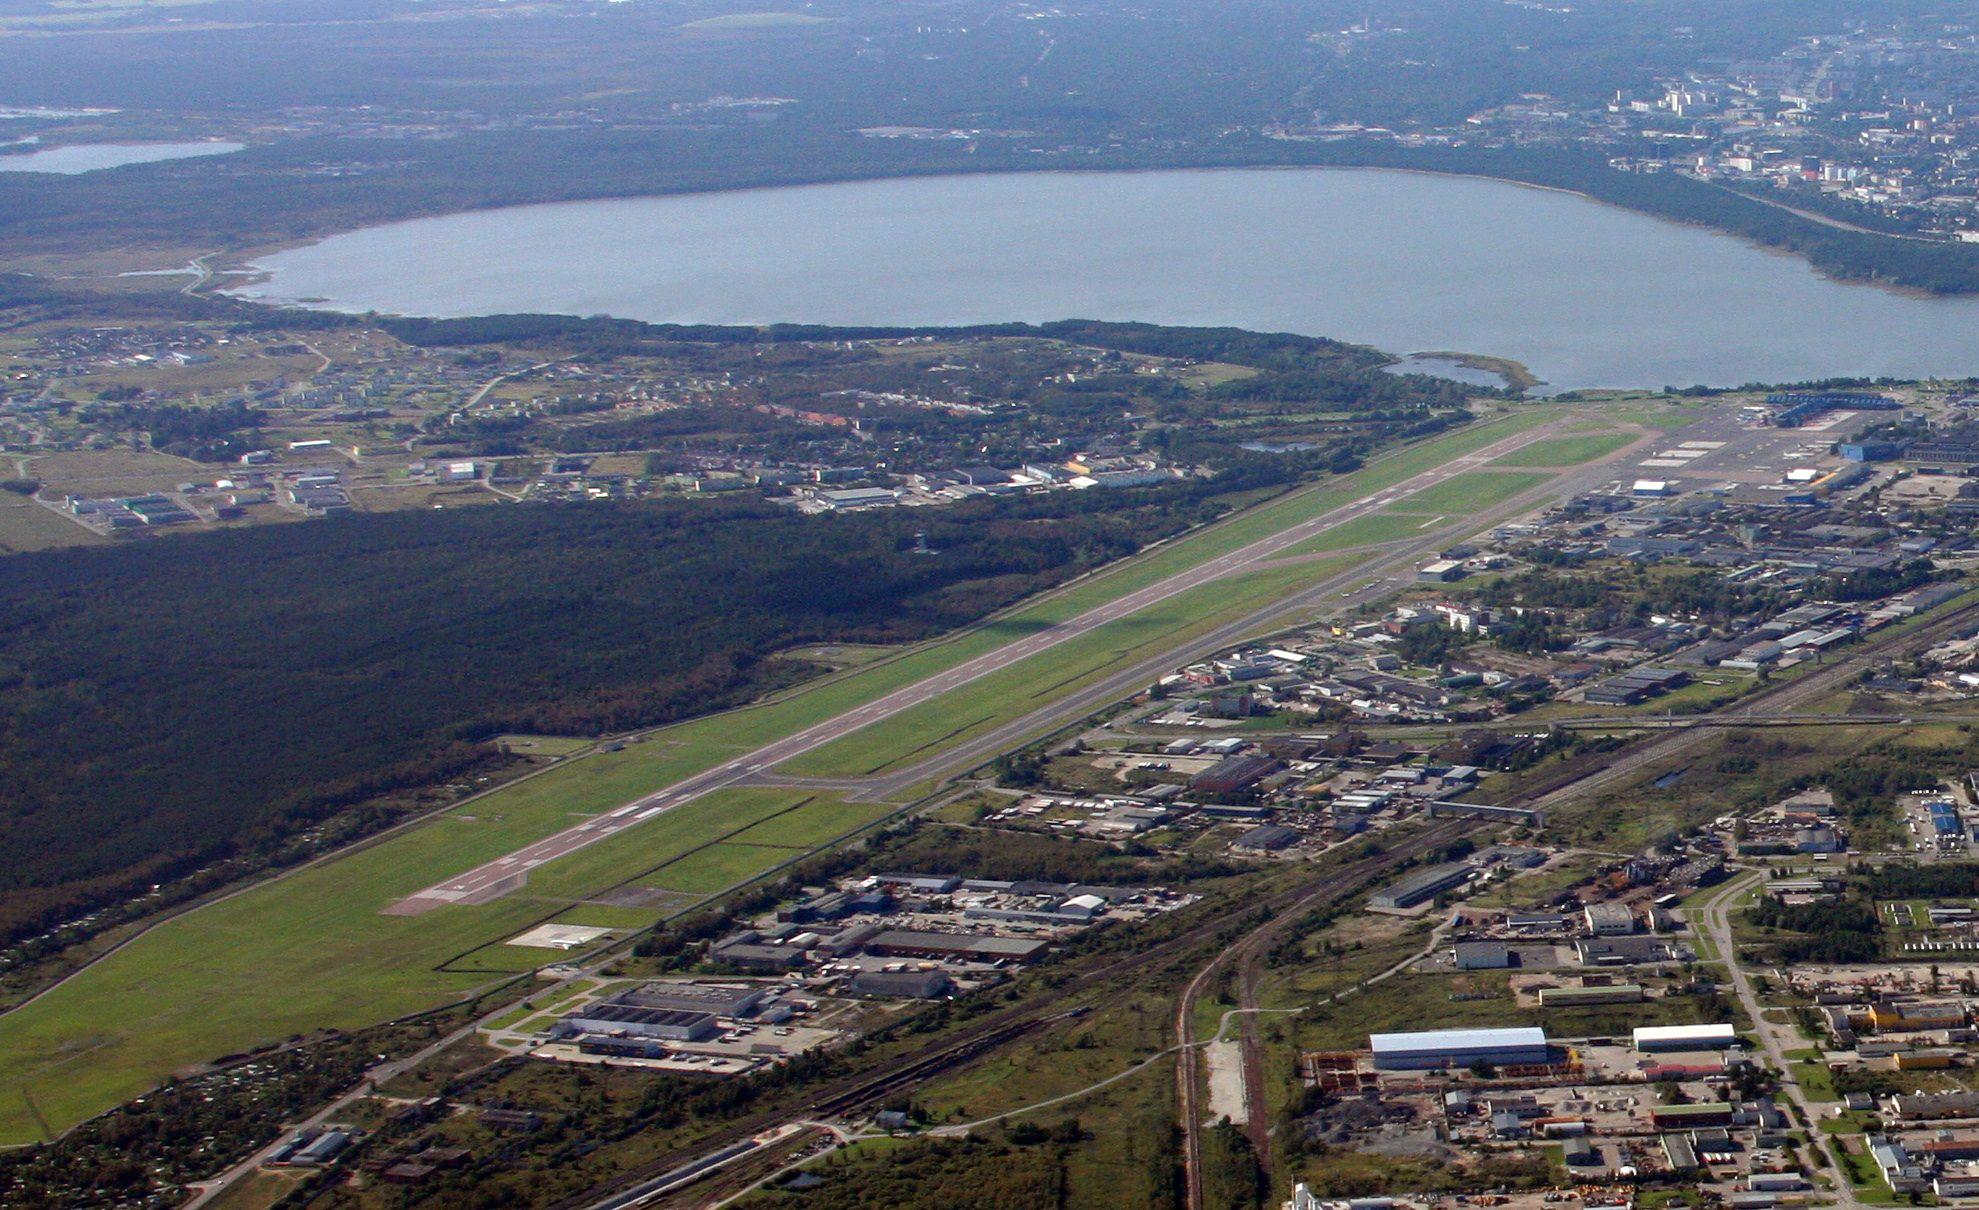 Depiction of Aeropuerto de Tallin